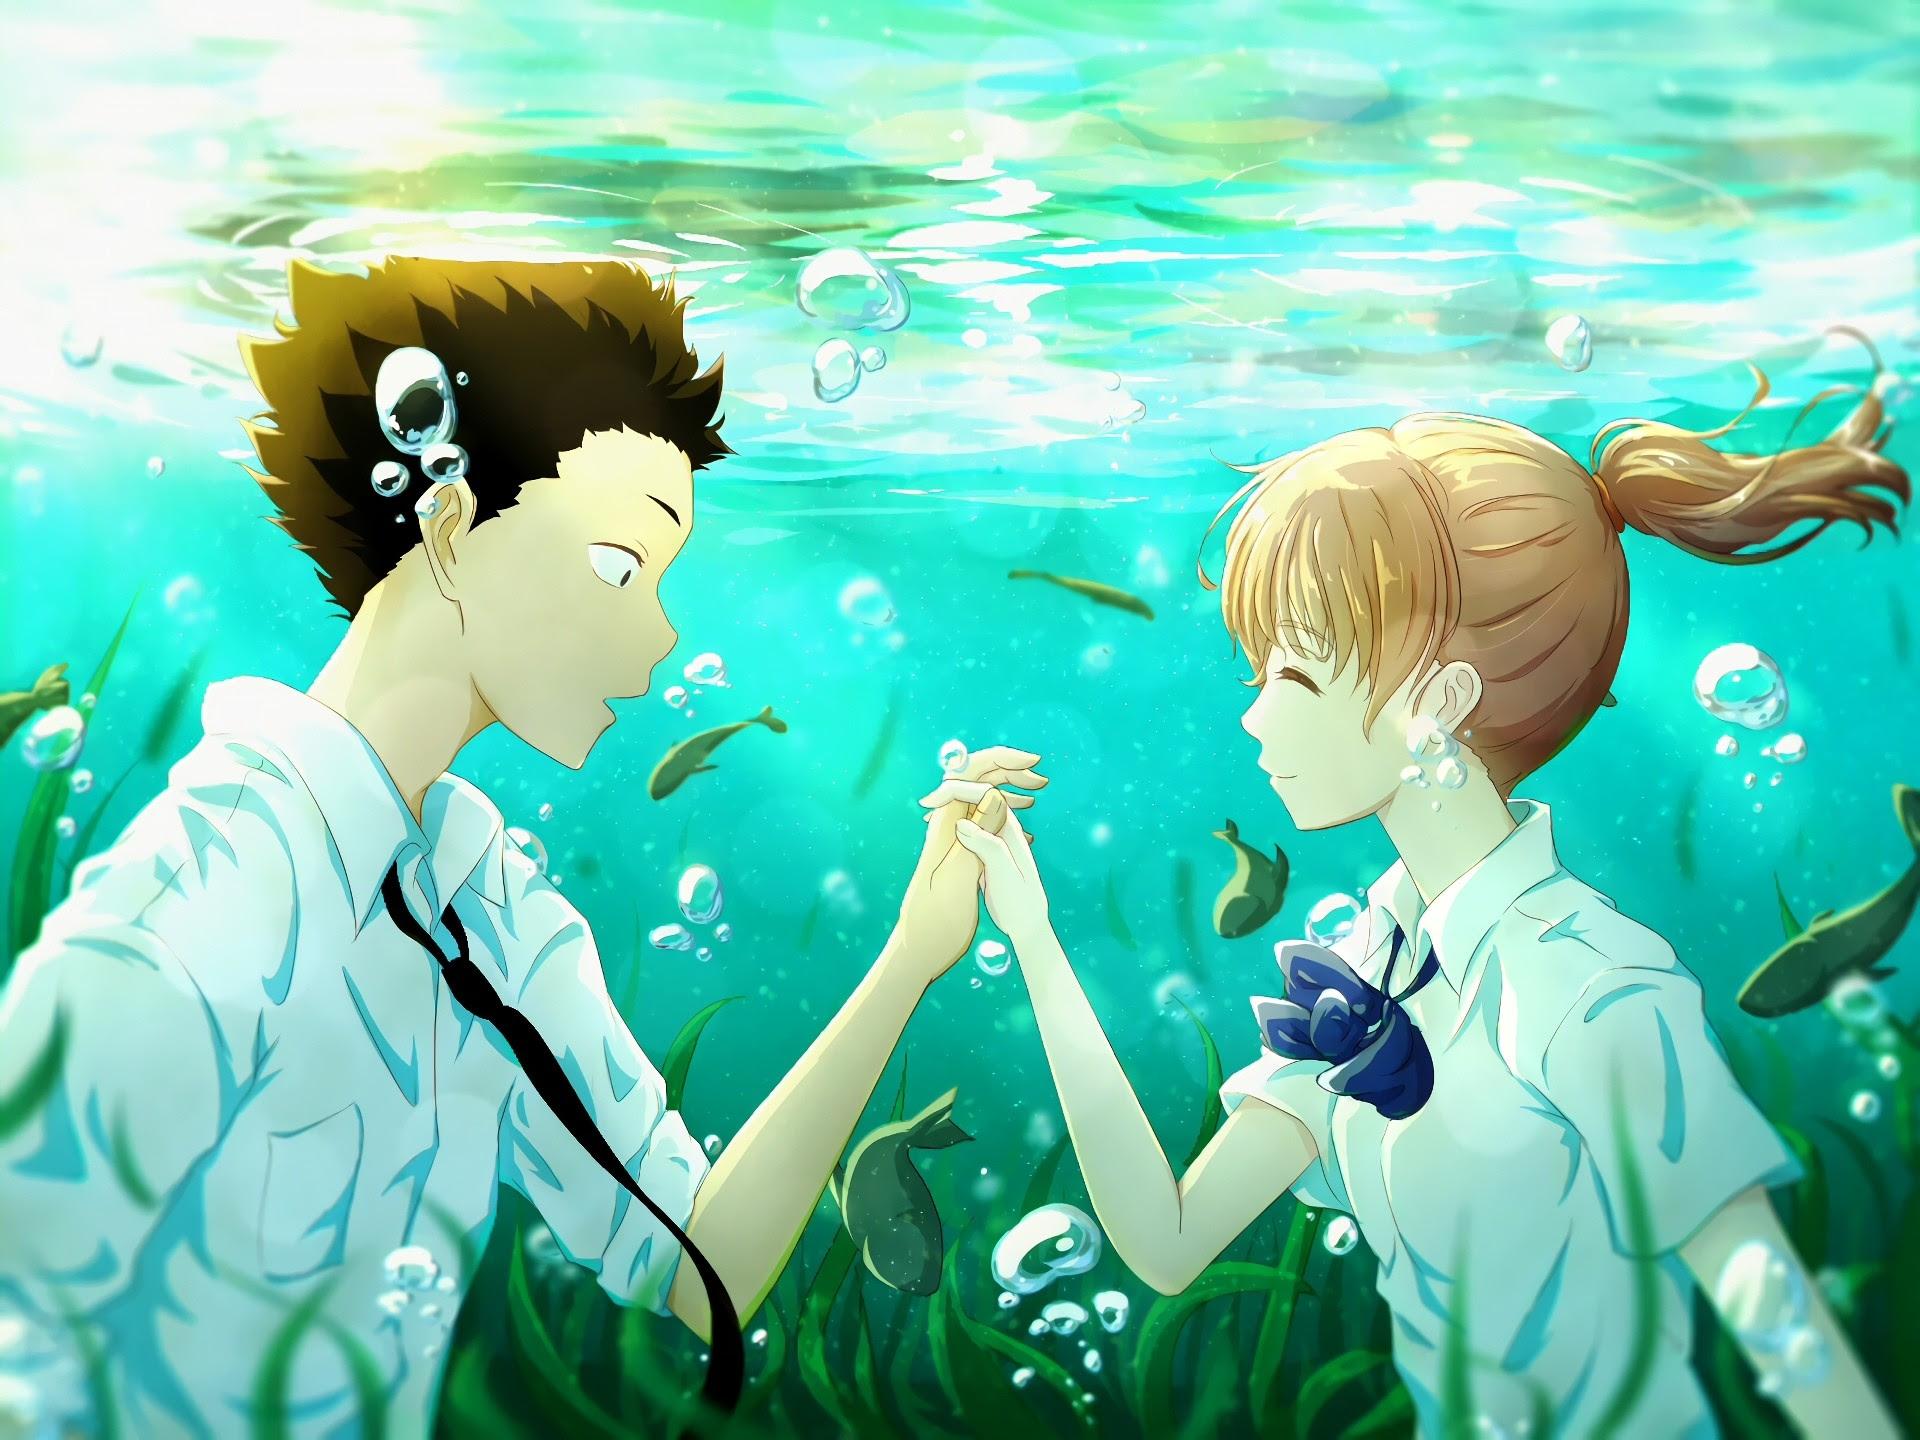 Anime Fun Wallpaper Anime Kyoukai No Kanata